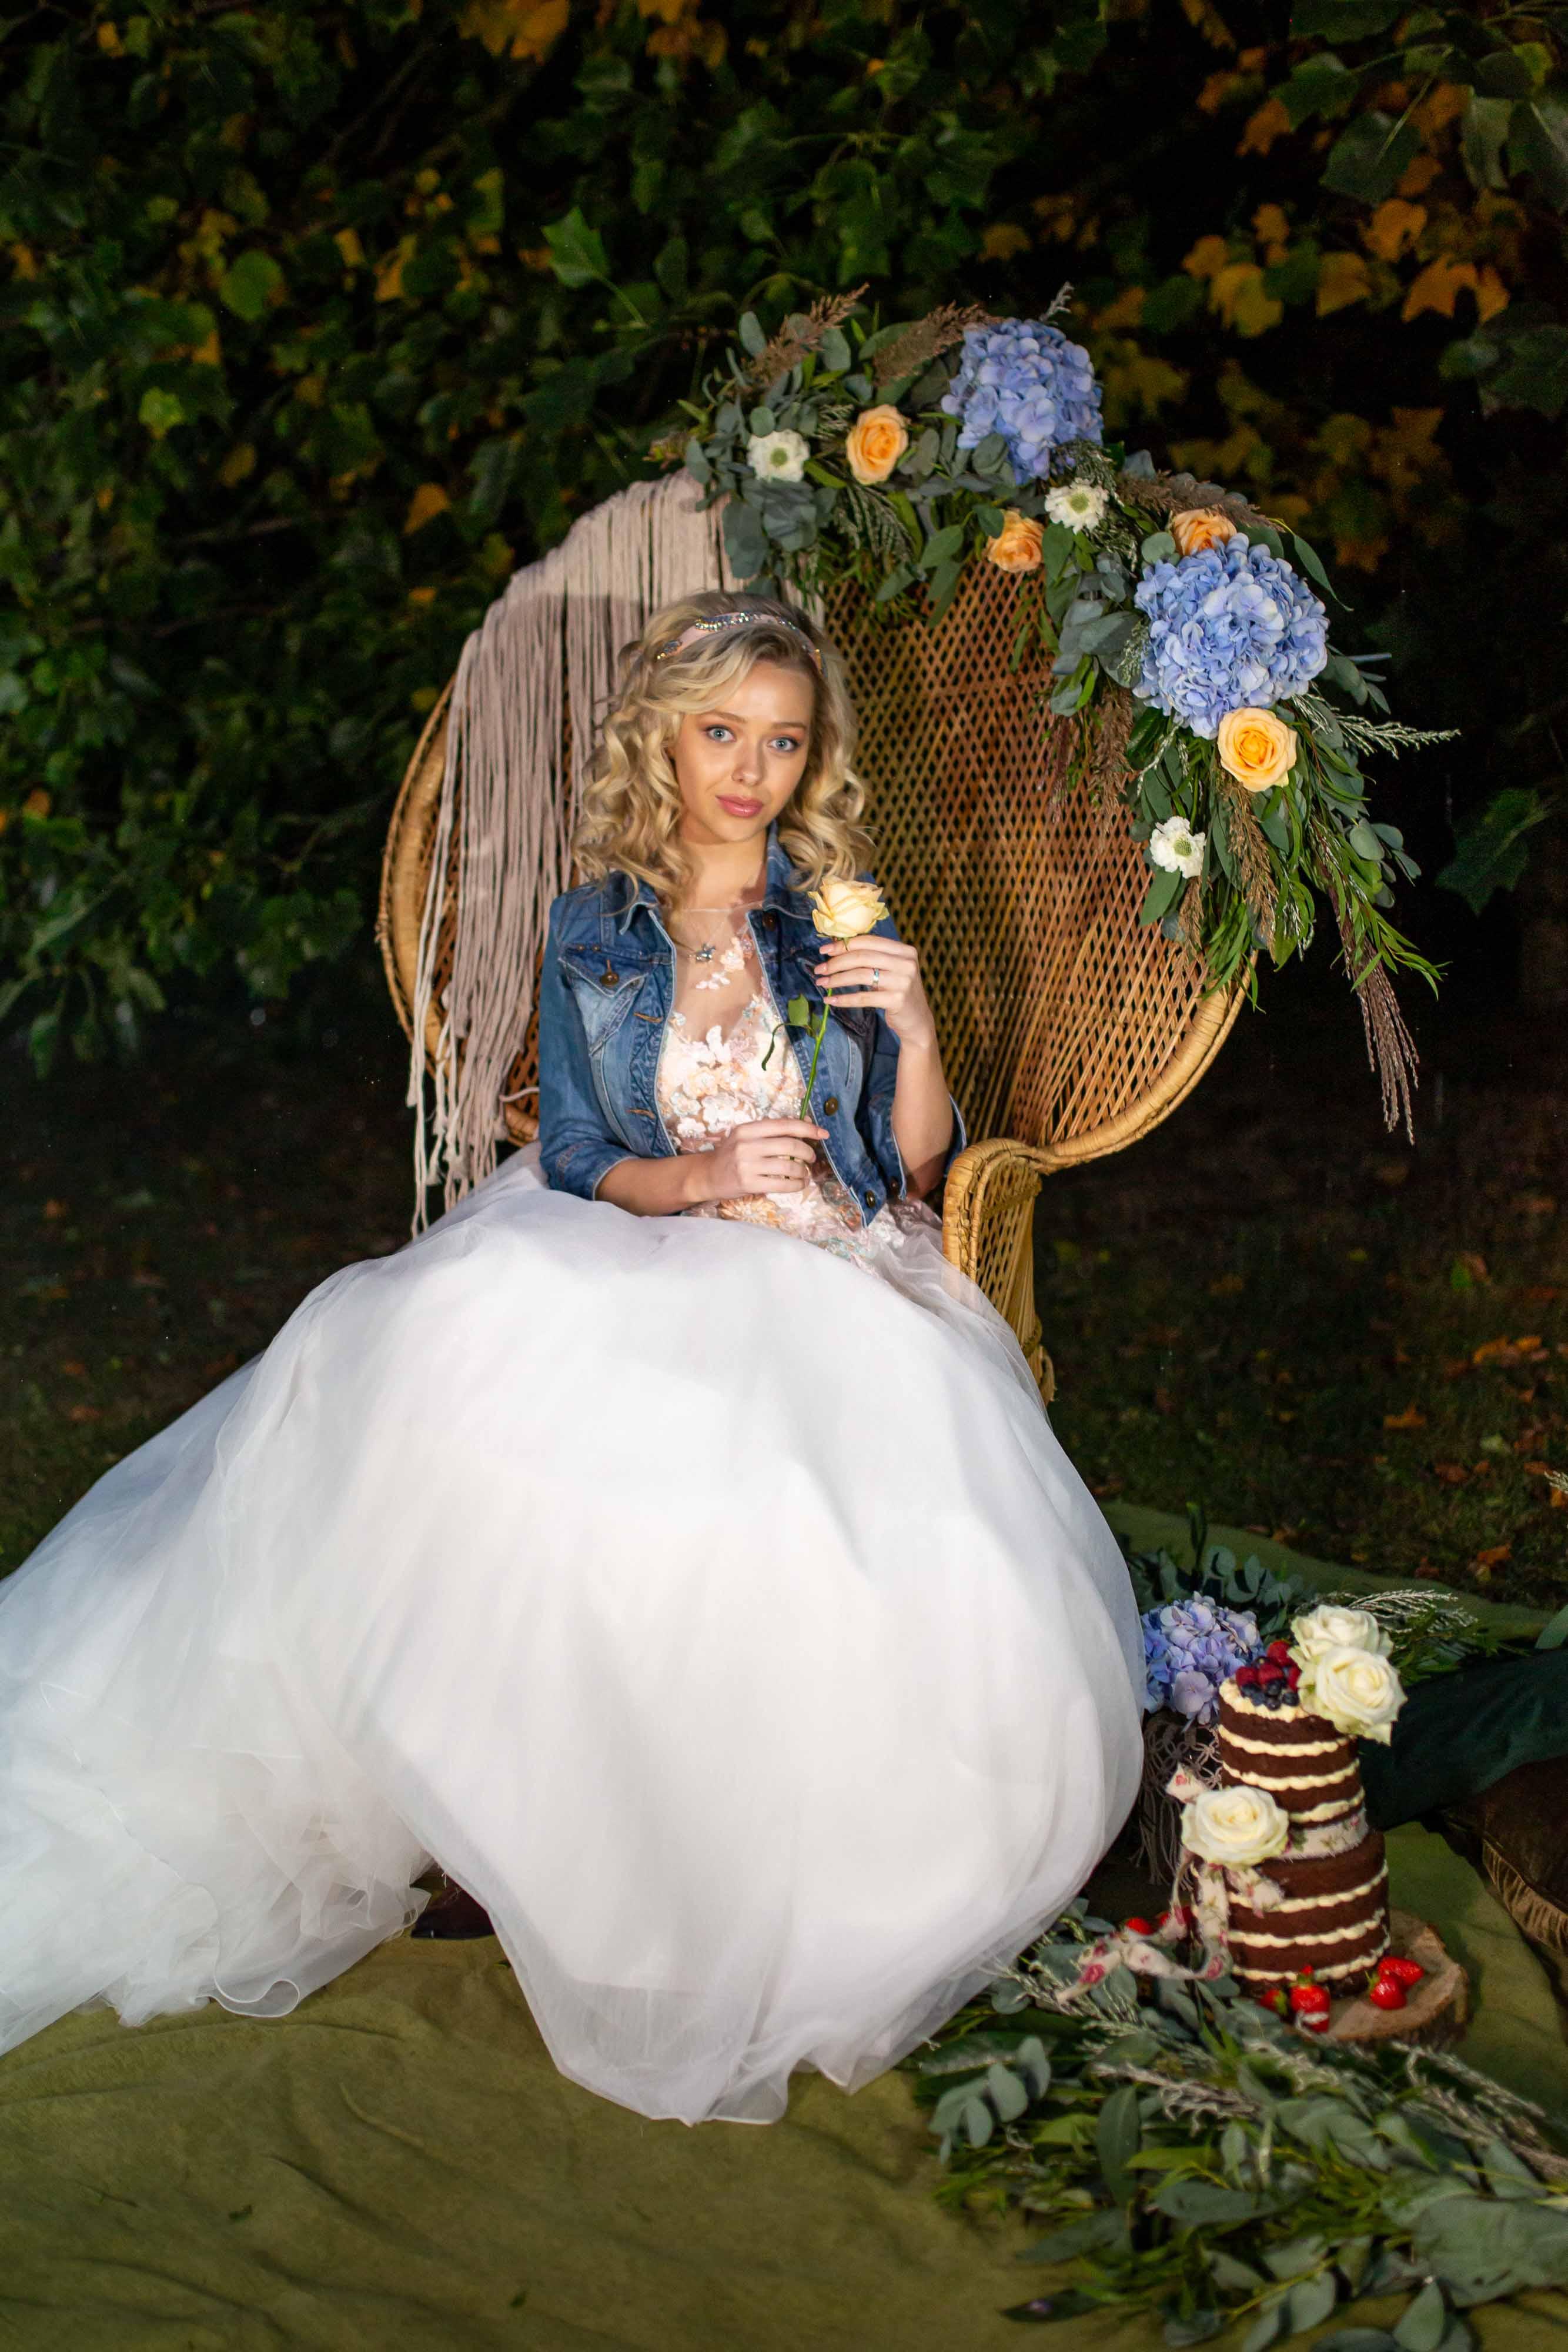 iconic wedding looks- music themed wedding- unconventional wedding- alternative wedding- wicker chair- southern wedding styling